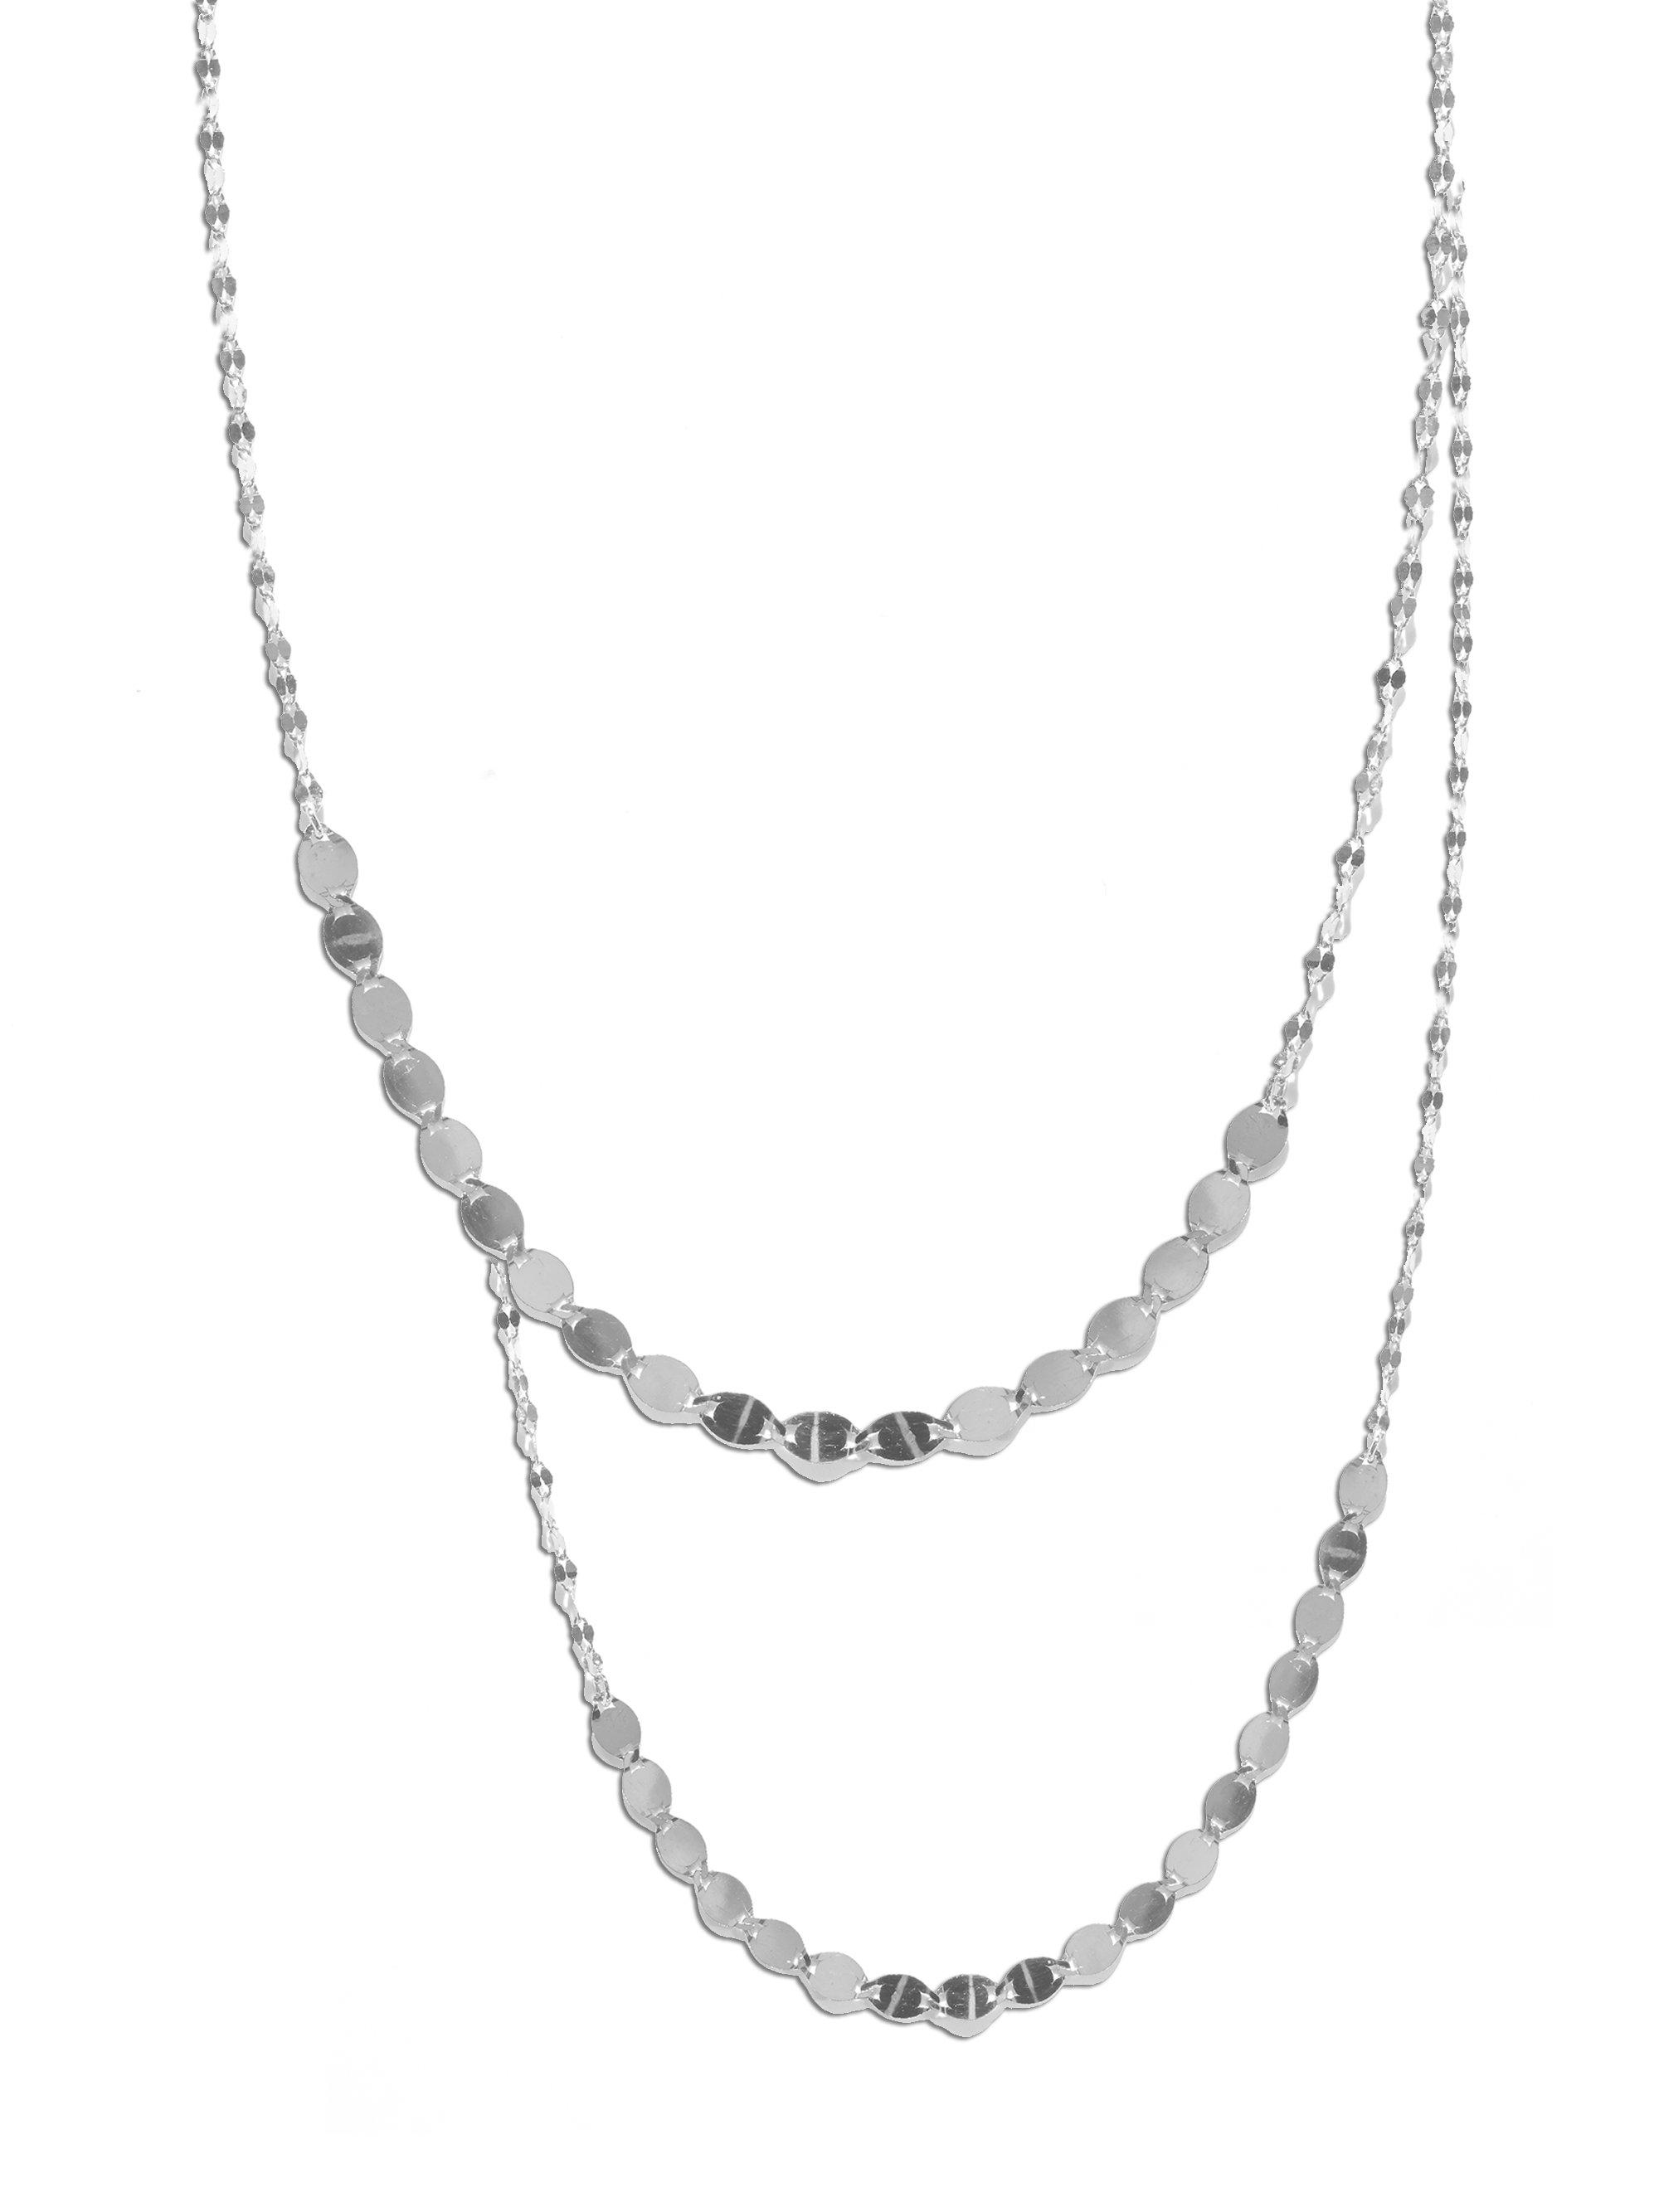 Lana Jewelry 14k Petite Nude Chain Choker Necklace - Lyst